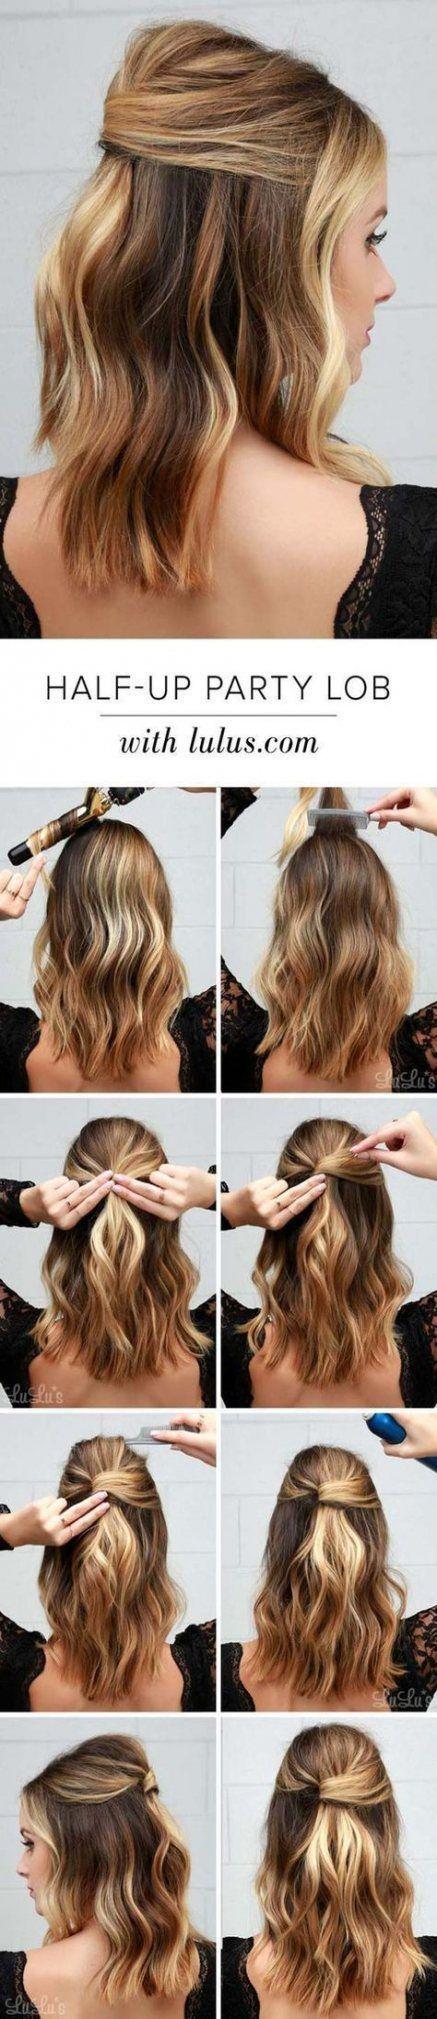 20 Trendy Style Hair Wedding Easy Hairstyles Hair Wedding Hairstyles Style Party Hairstyles Medium Hair Styles Medium Hair Styles